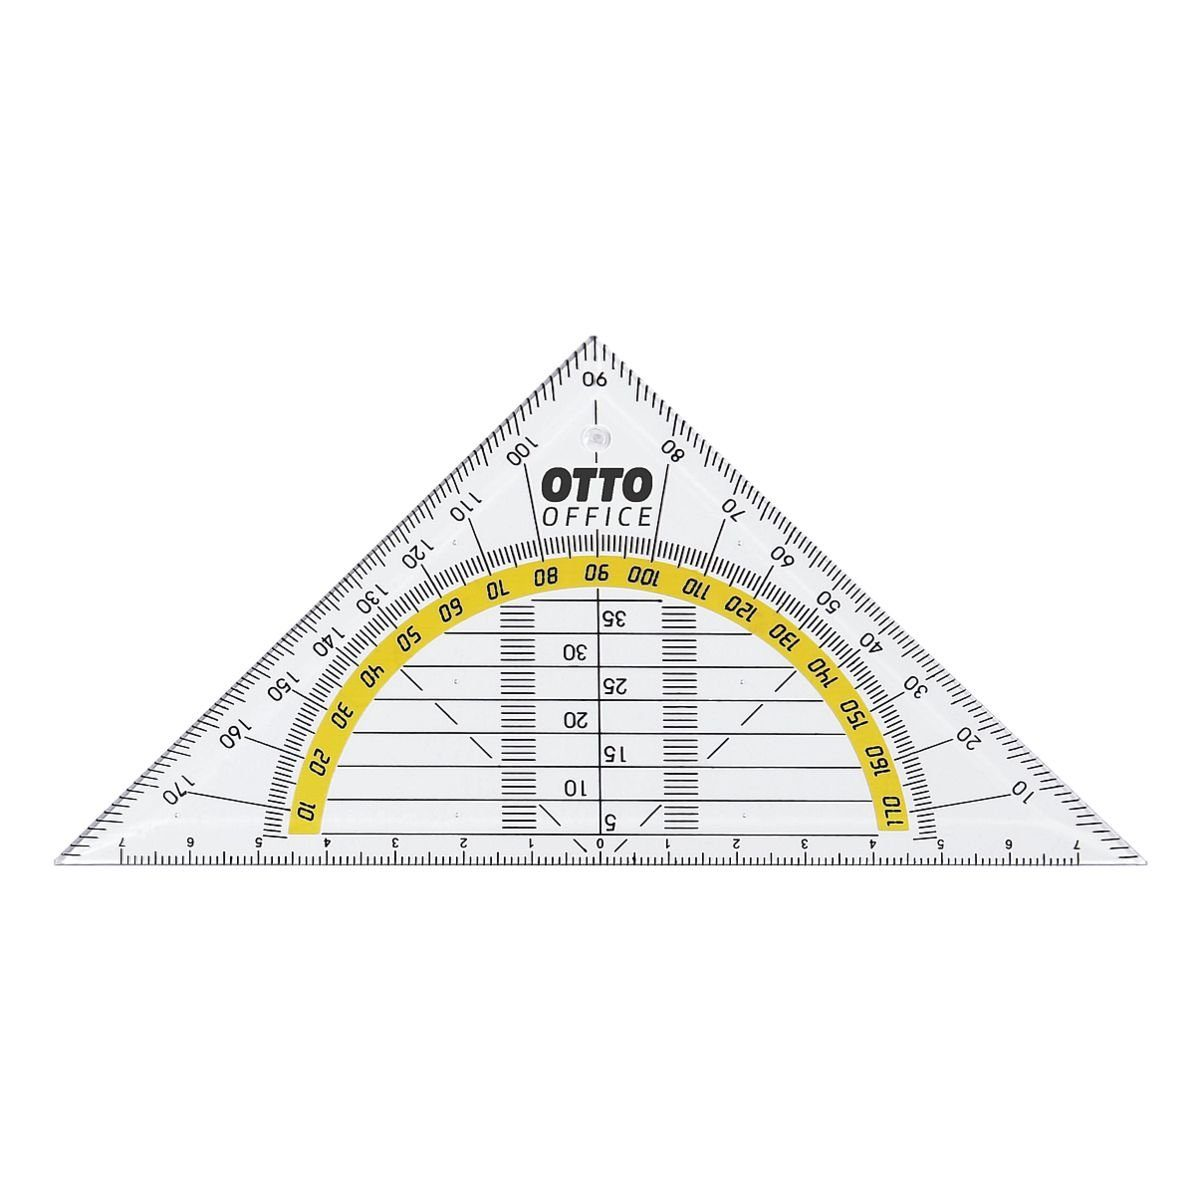 OTTOOFFICE STANDARD Geometriedreieck 14 cm ohne Griff